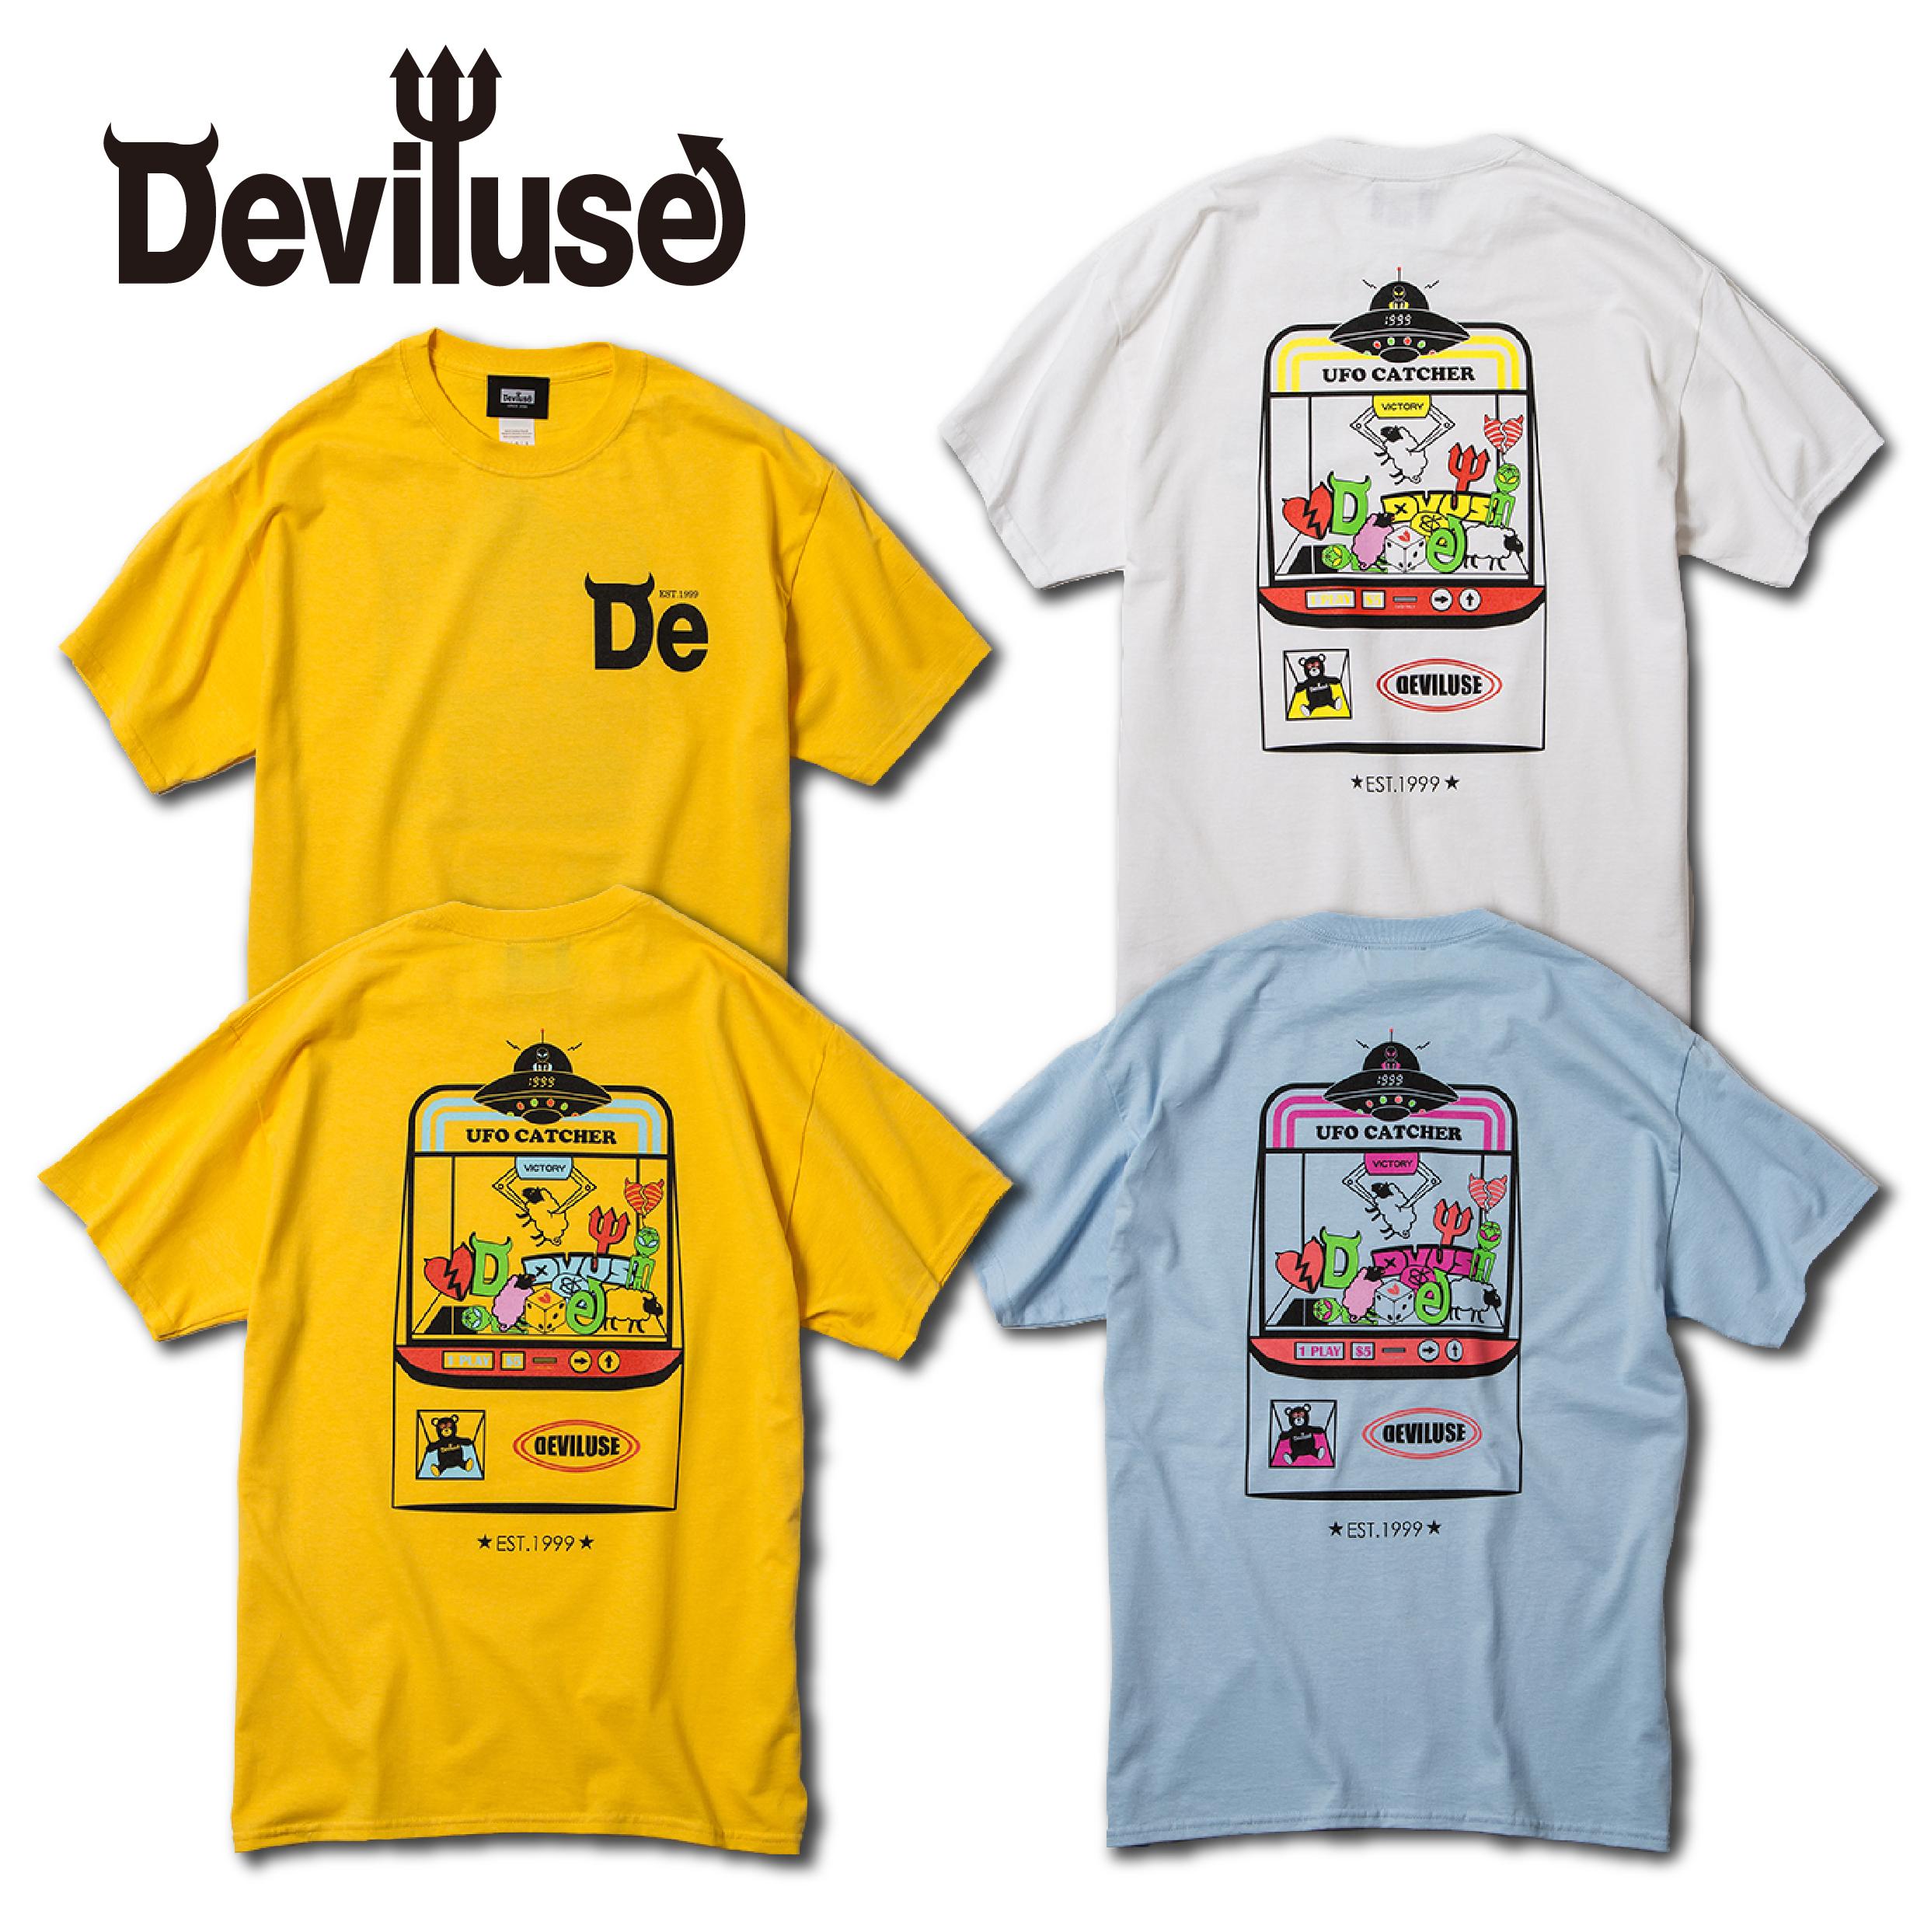 Deviluse(デビルユース) | UFO CATCHER T-shirts